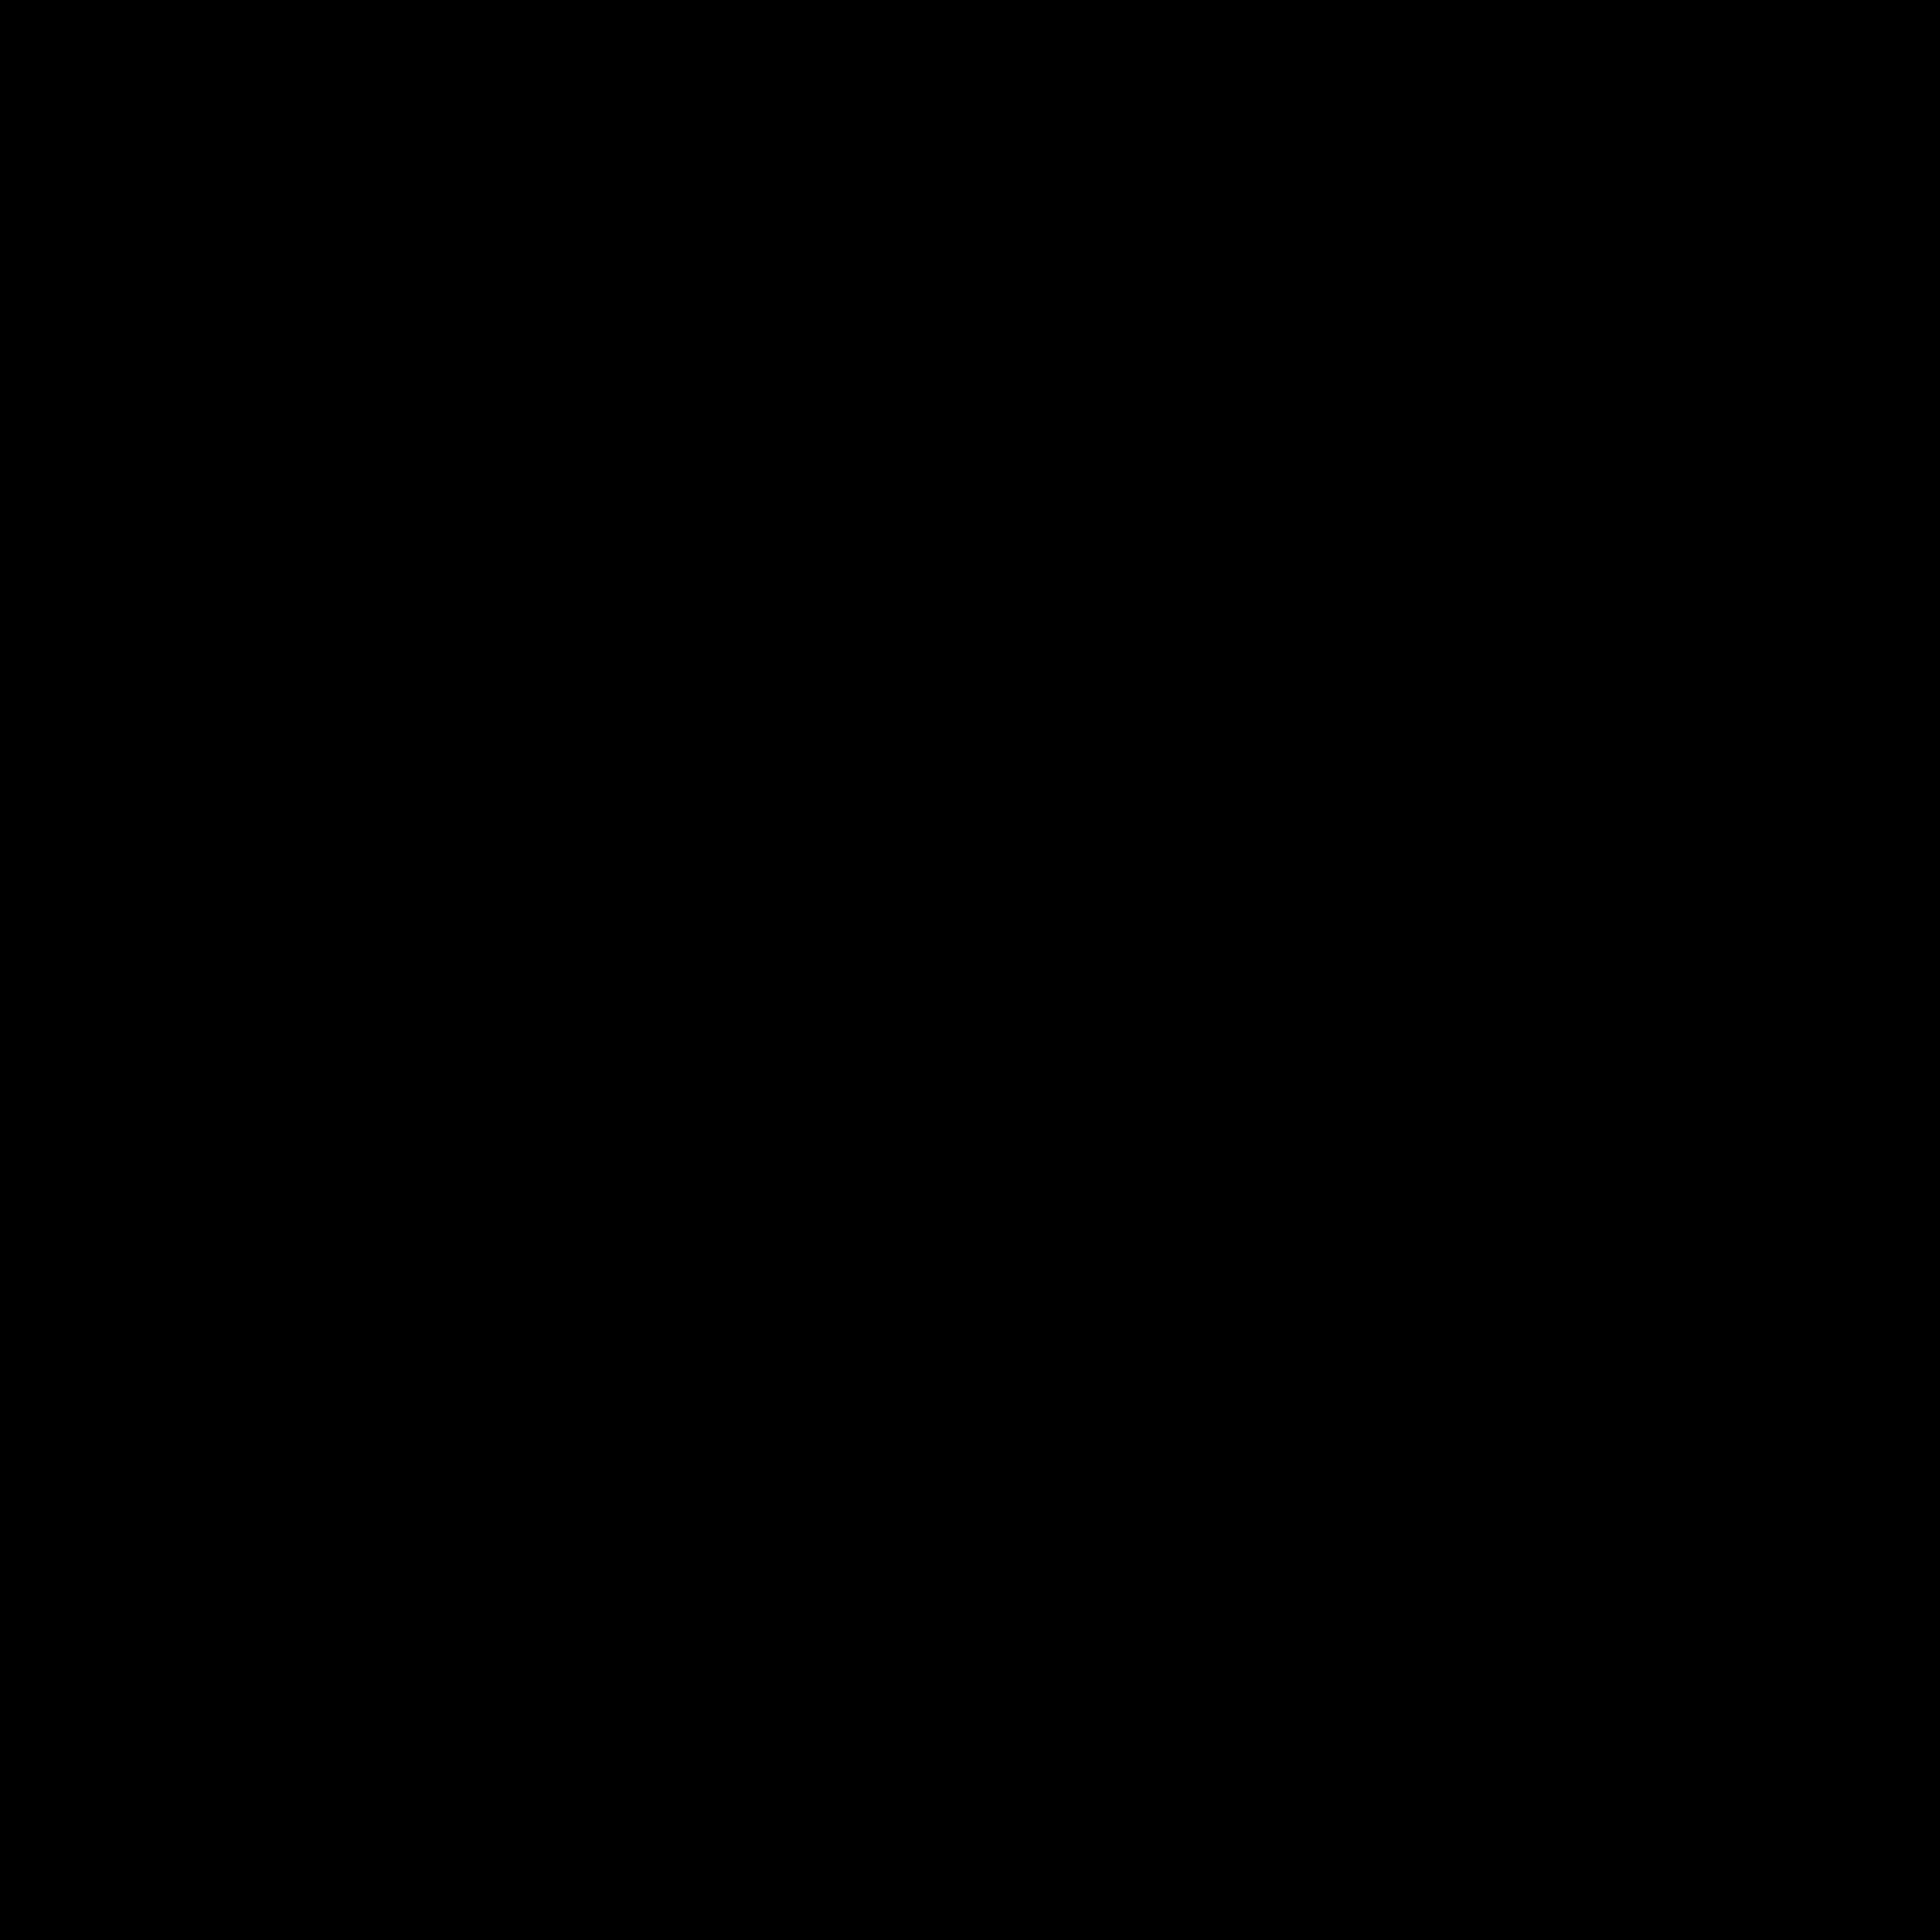 banner black and white stock vector hexagon octagon #107960965